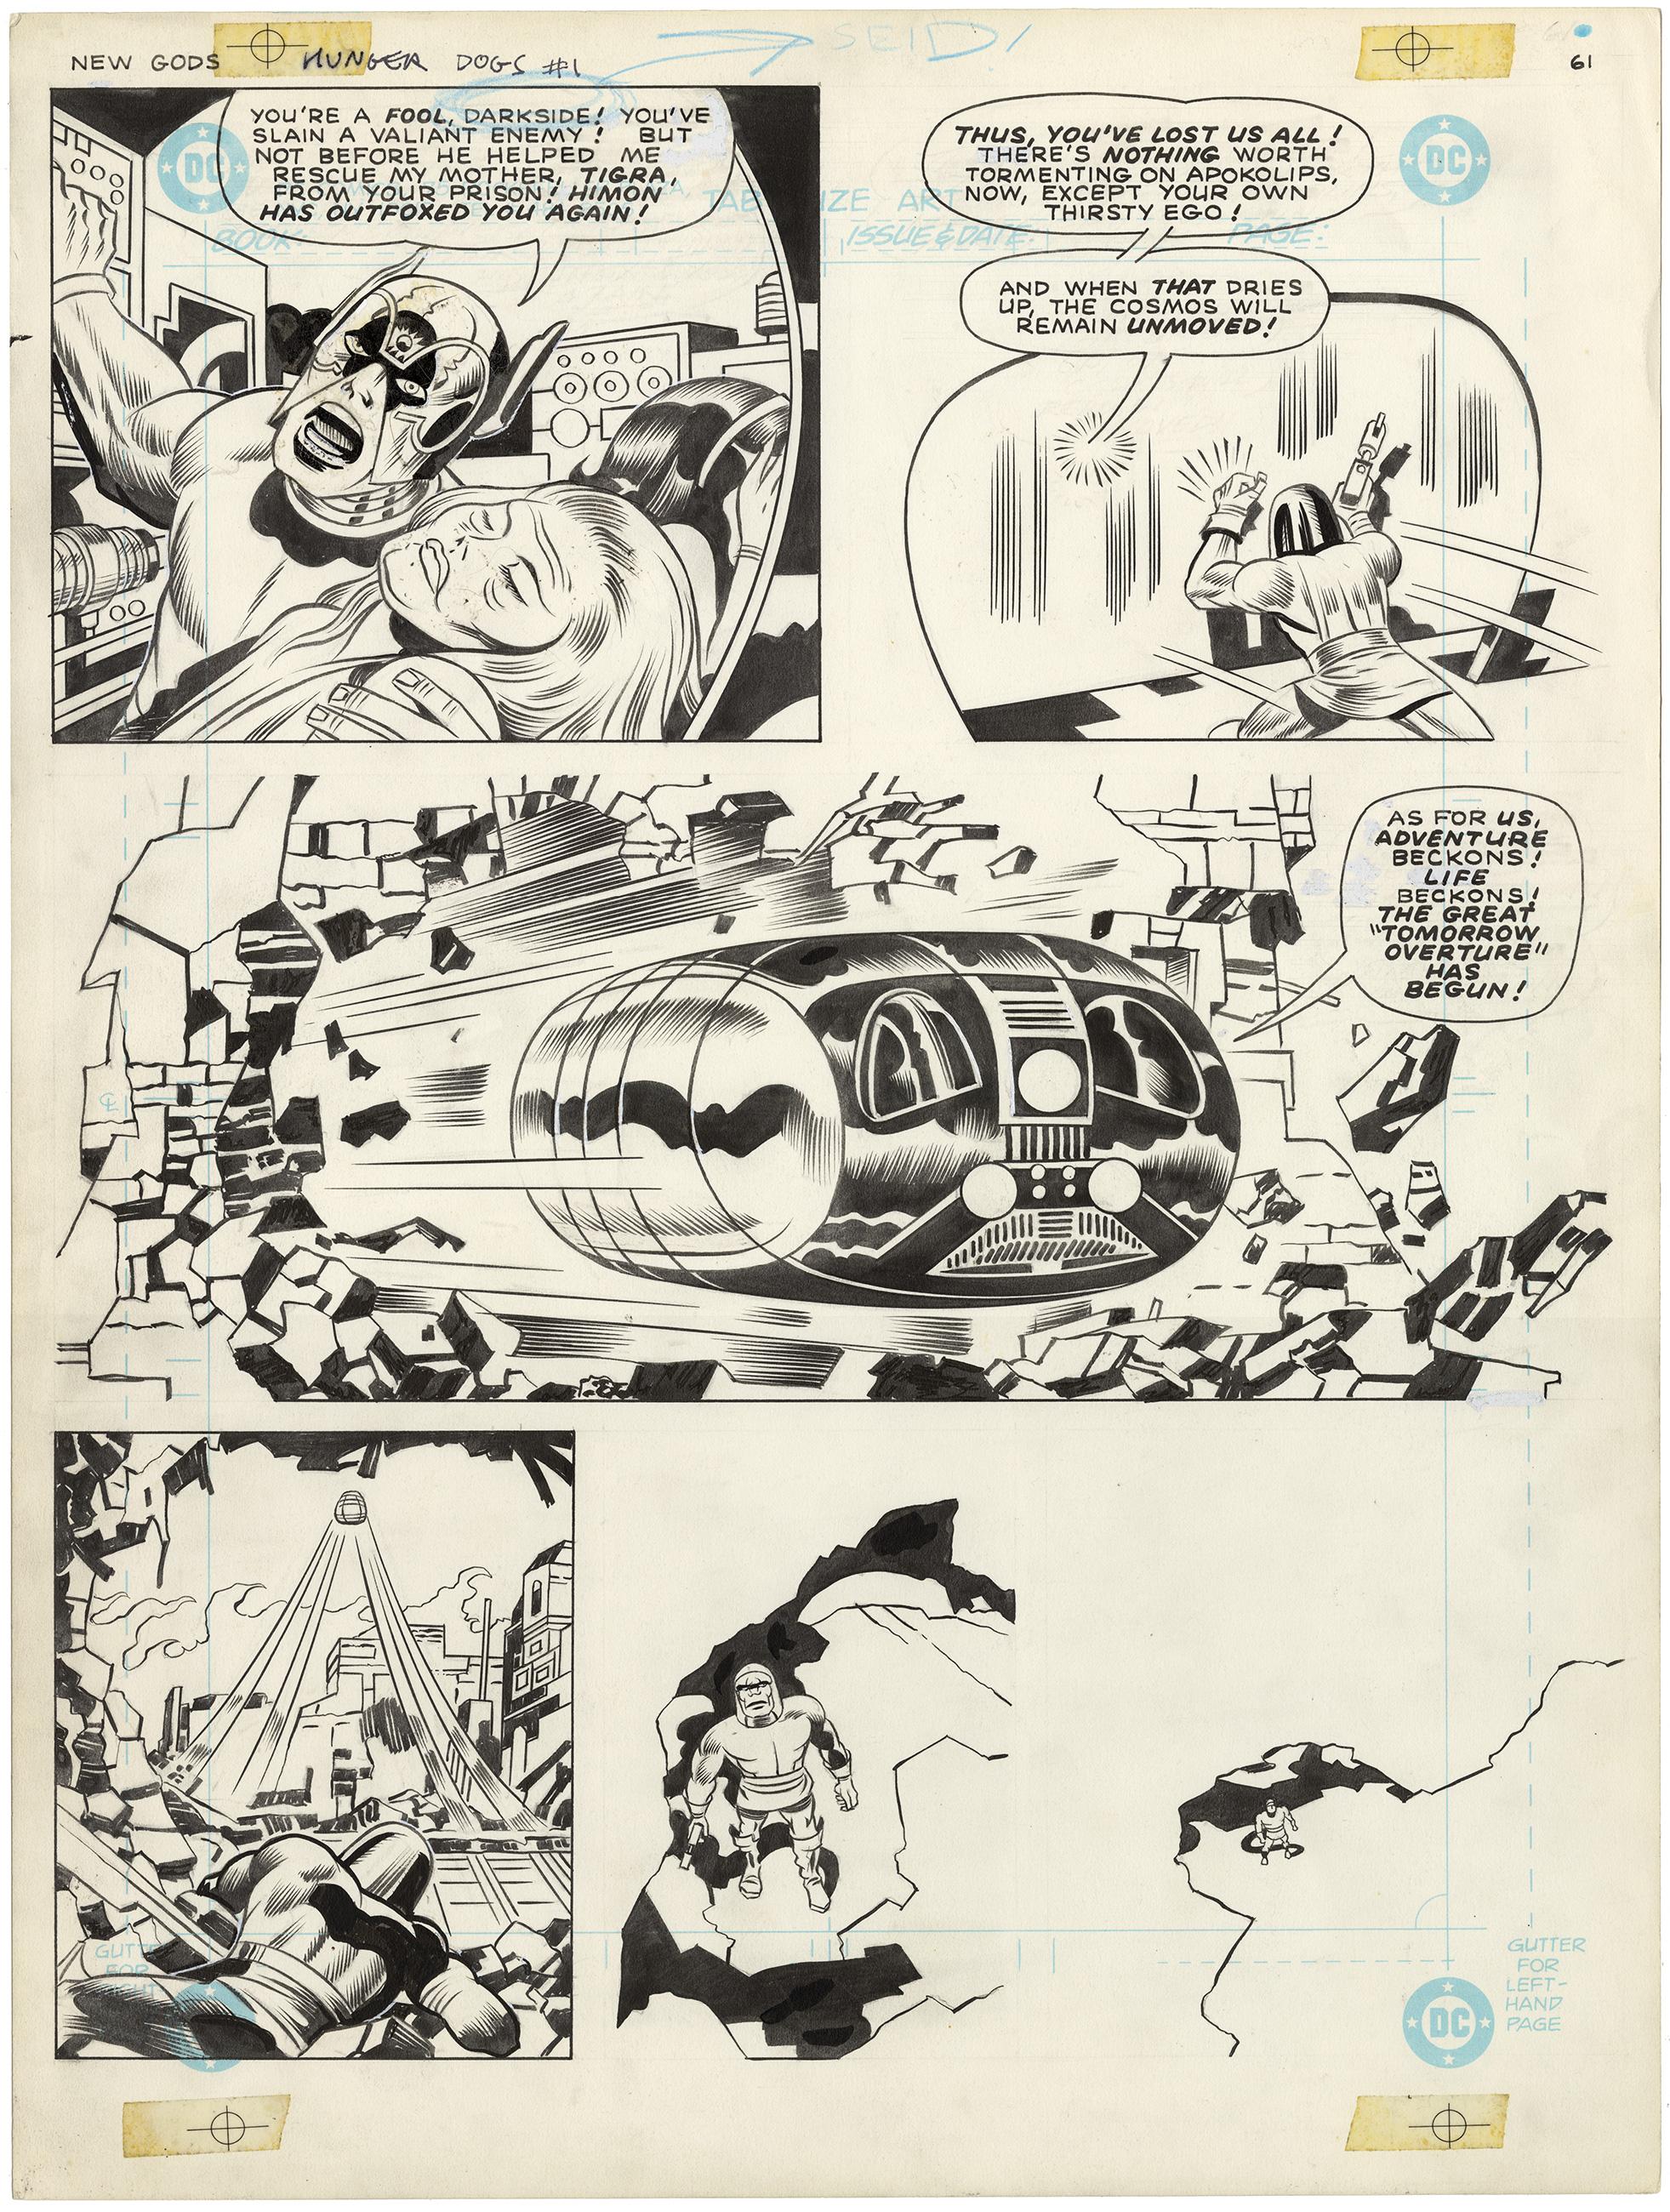 DC Graphic Novel - New Gods - Hunger Dogs (Large Art)